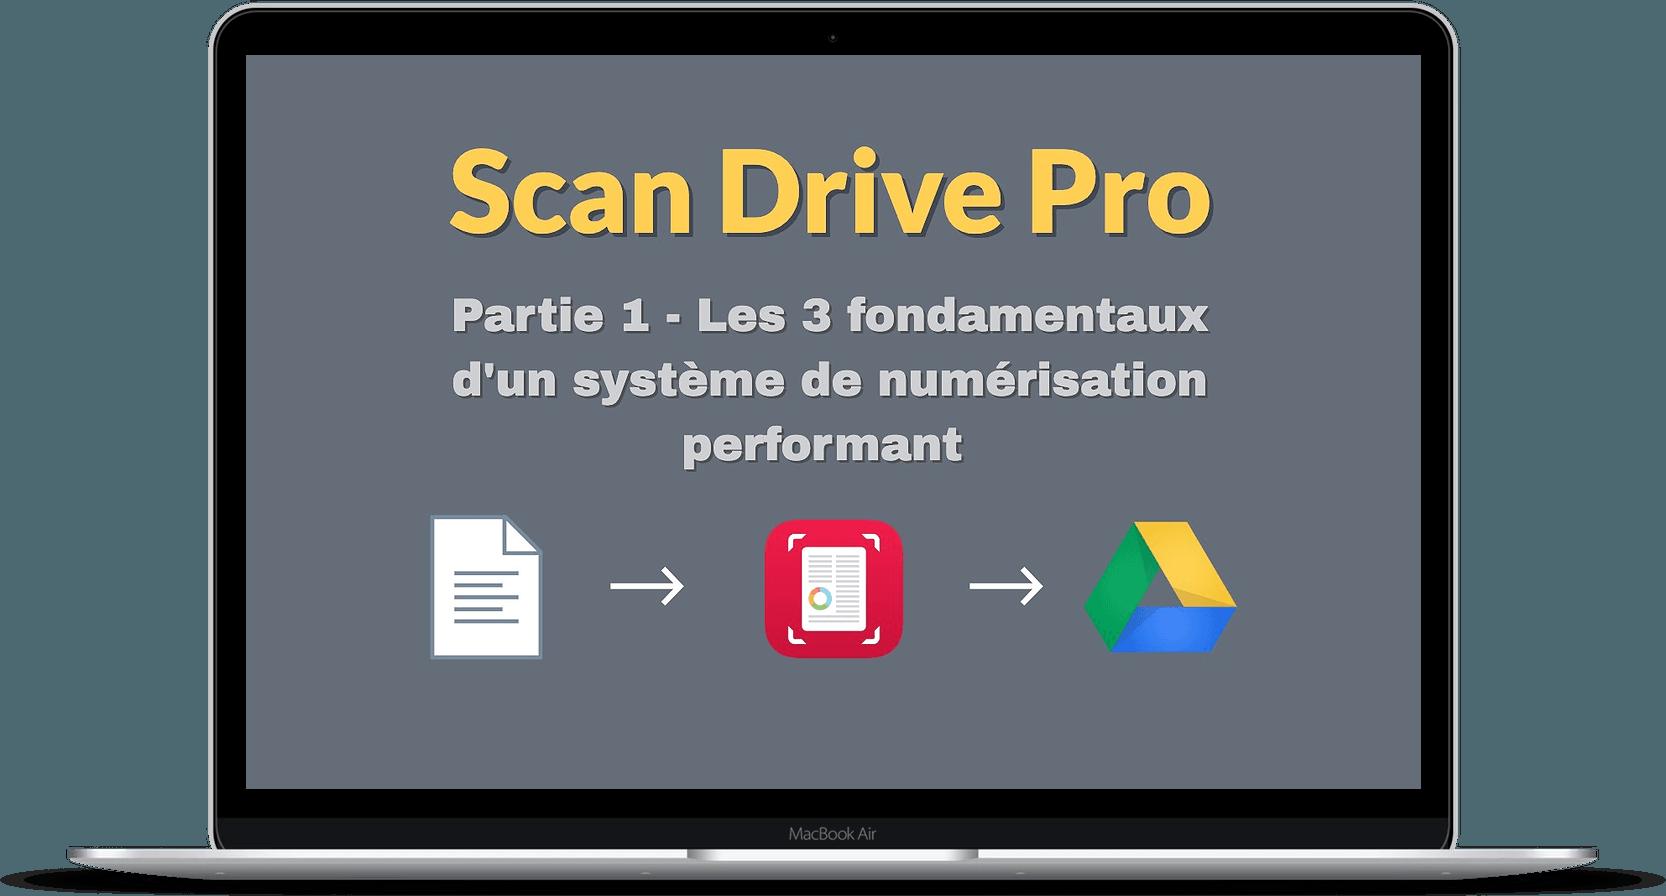 Scan Drive Pro